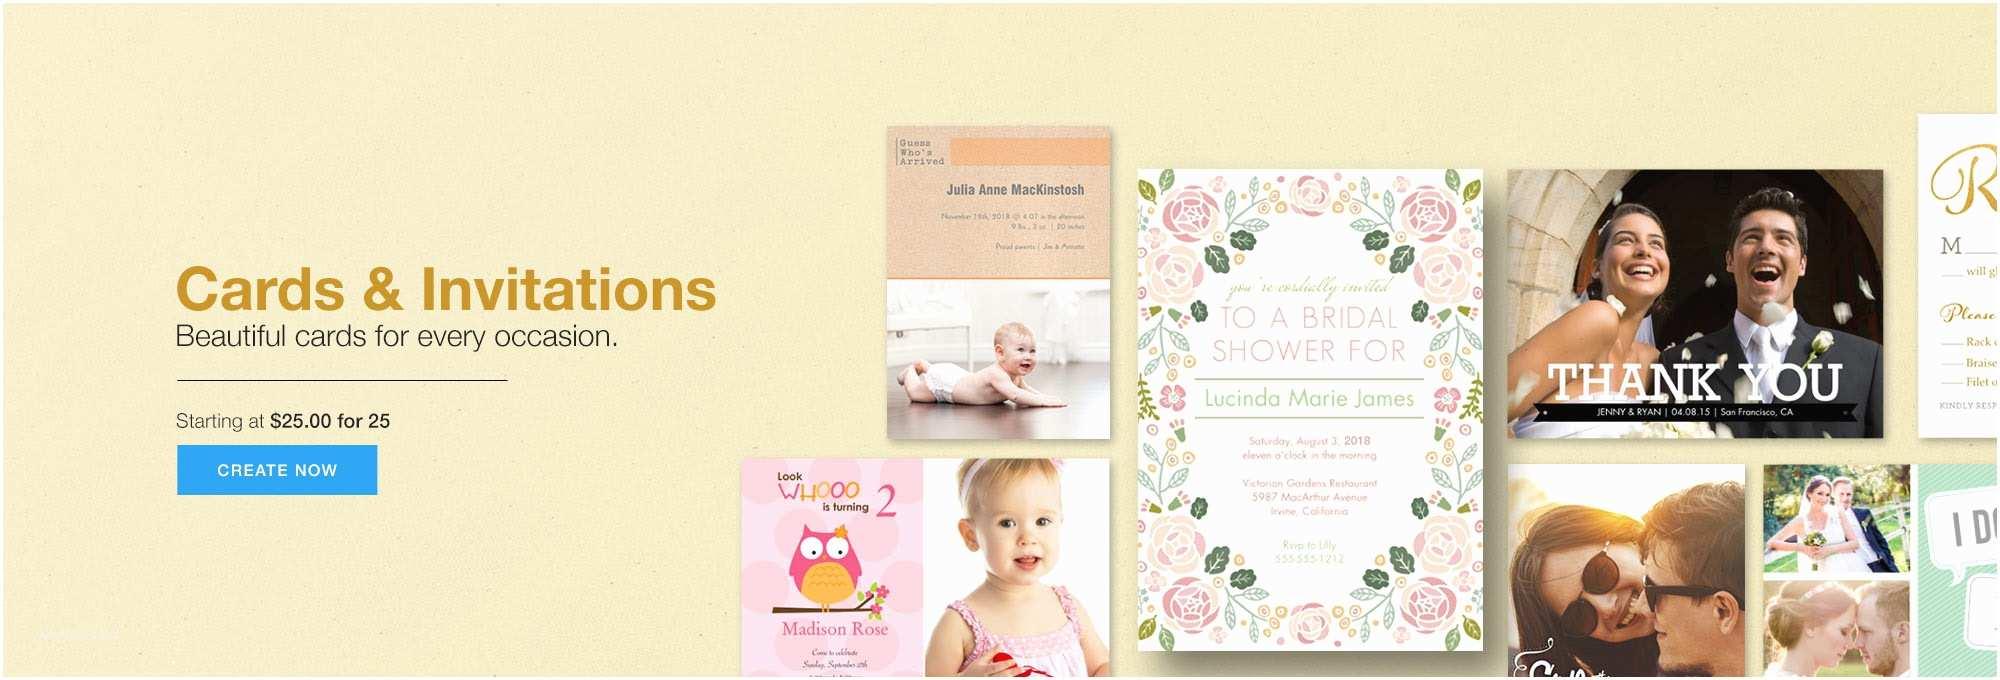 Staples Baby Shower Invitations Staples Baby Shower Invitations